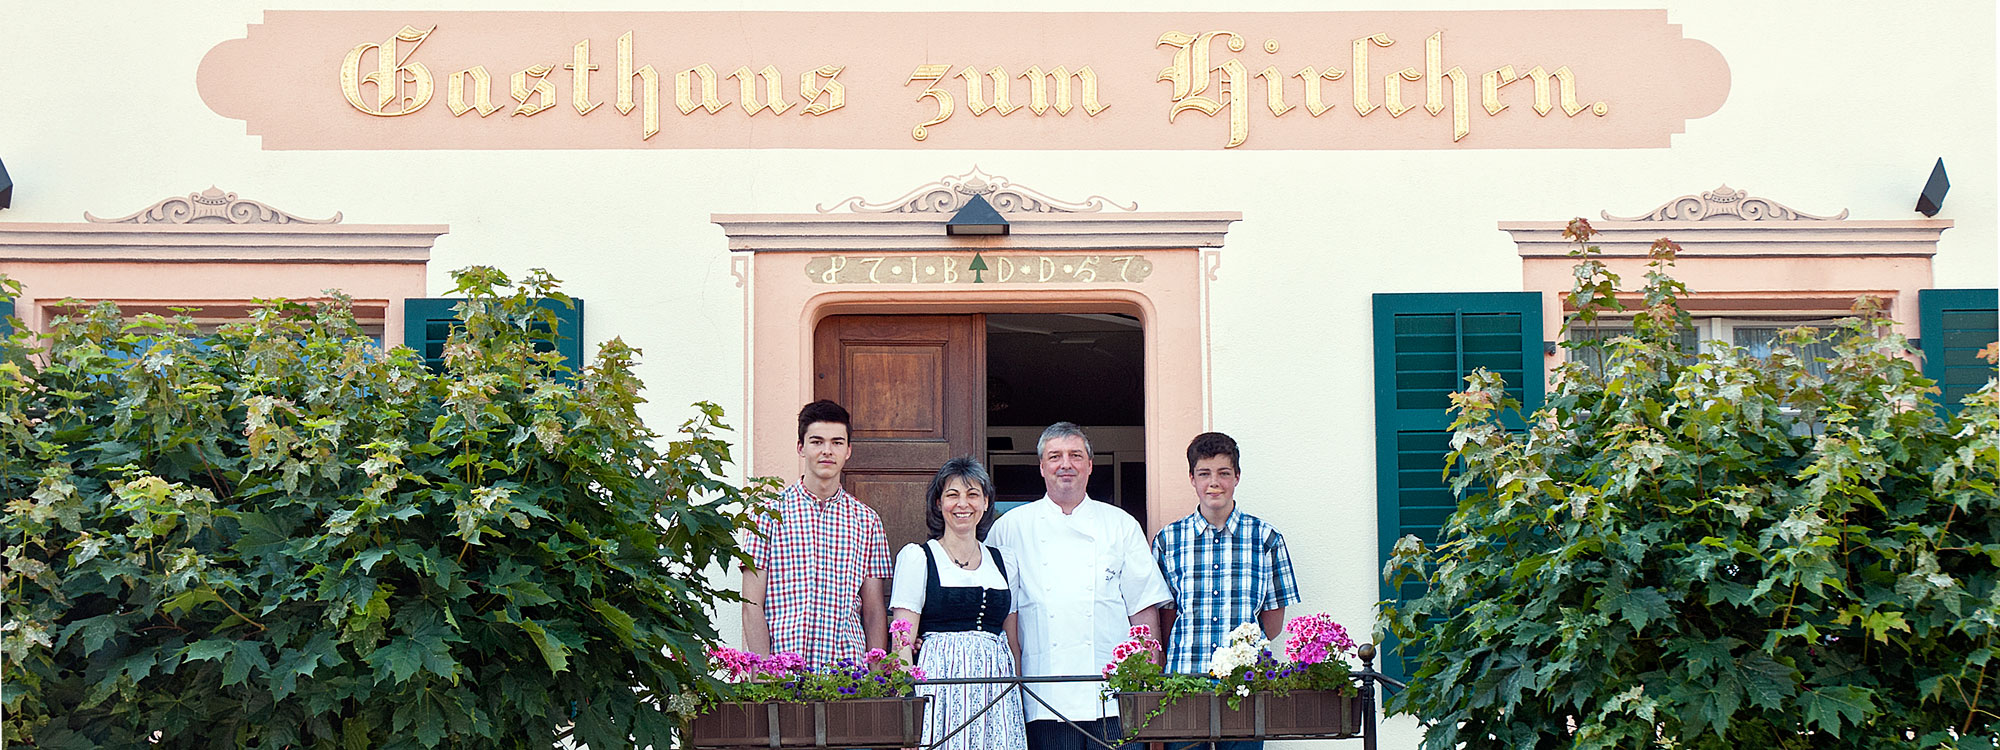 Familie-Albiez-Eingang_slider